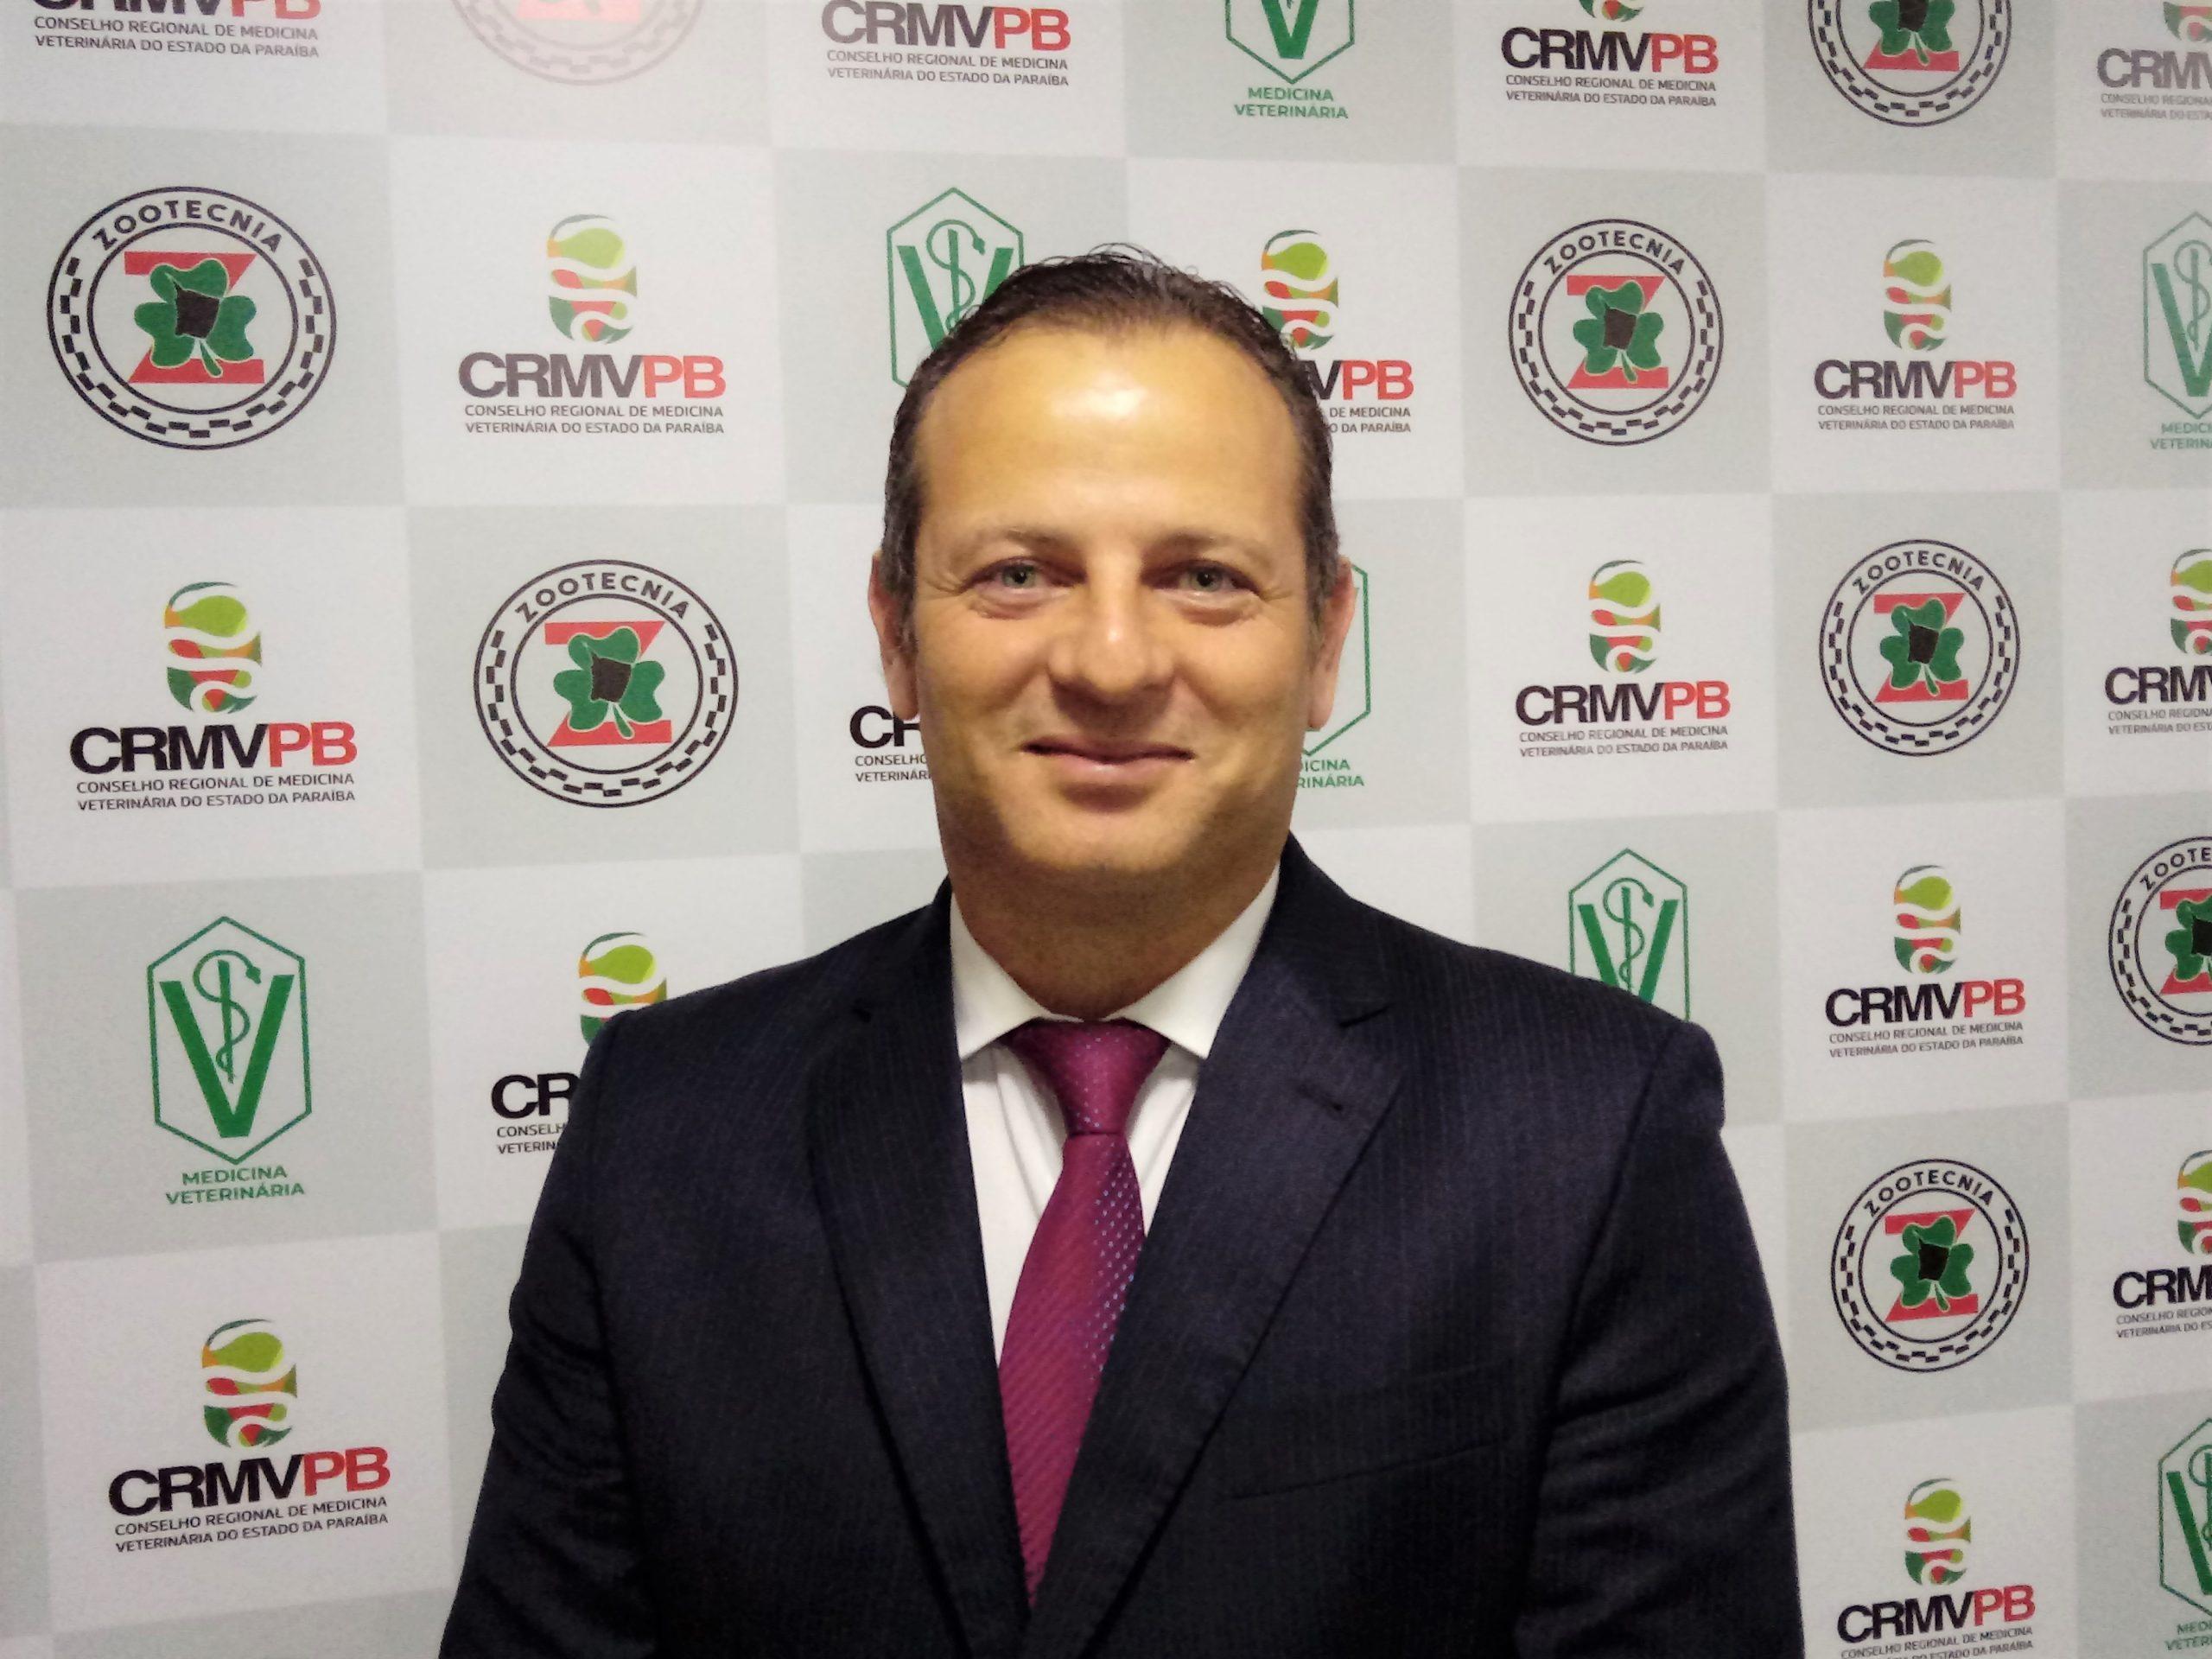 Leopoldo Mayer de Freitas Neto